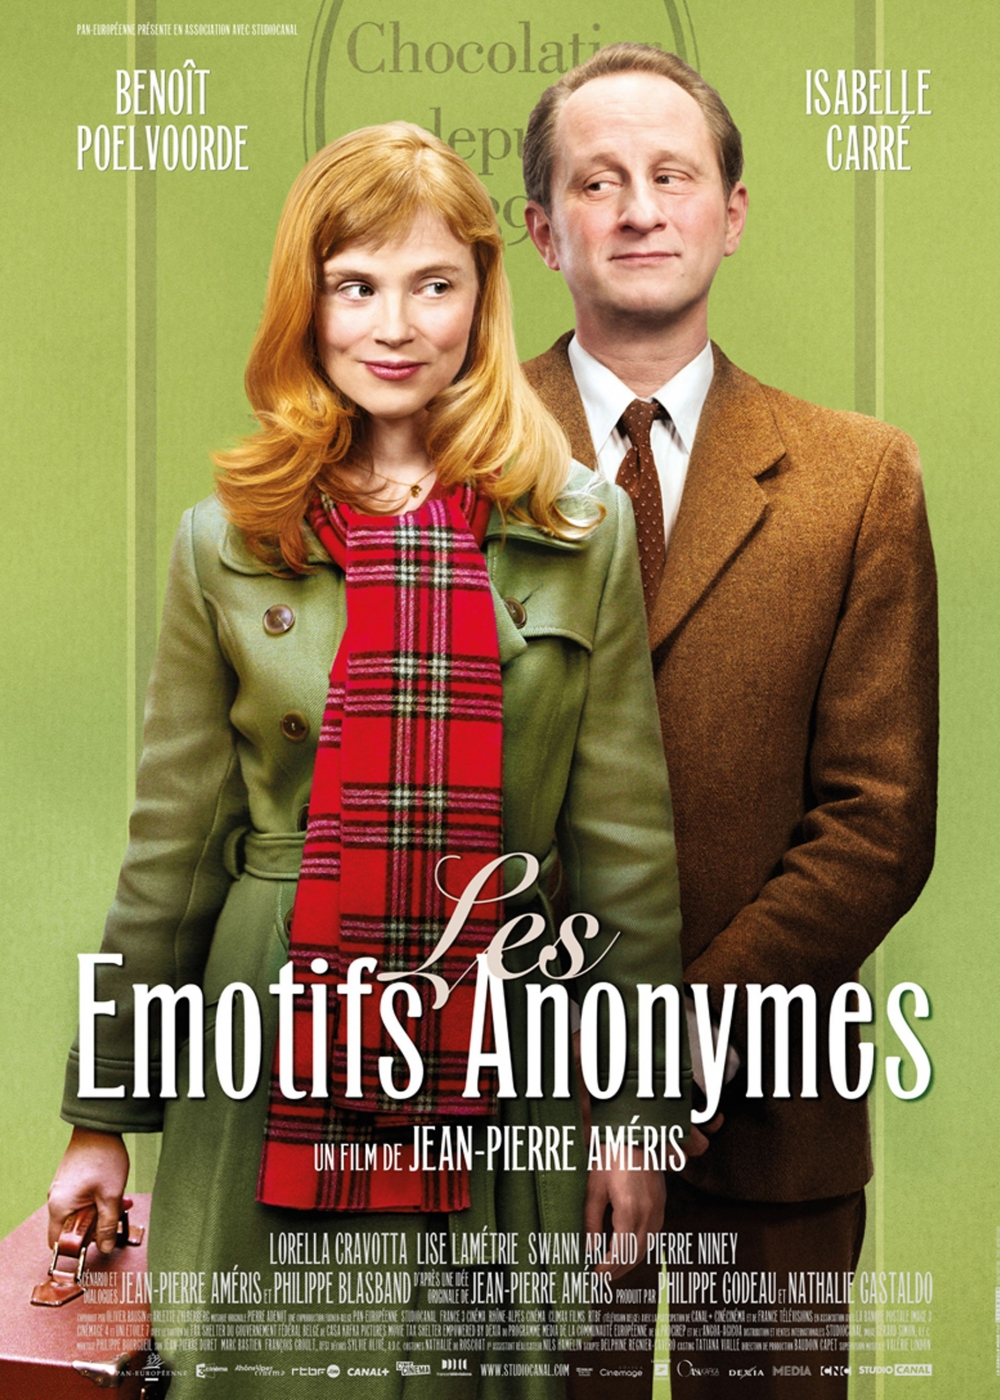 anonymen